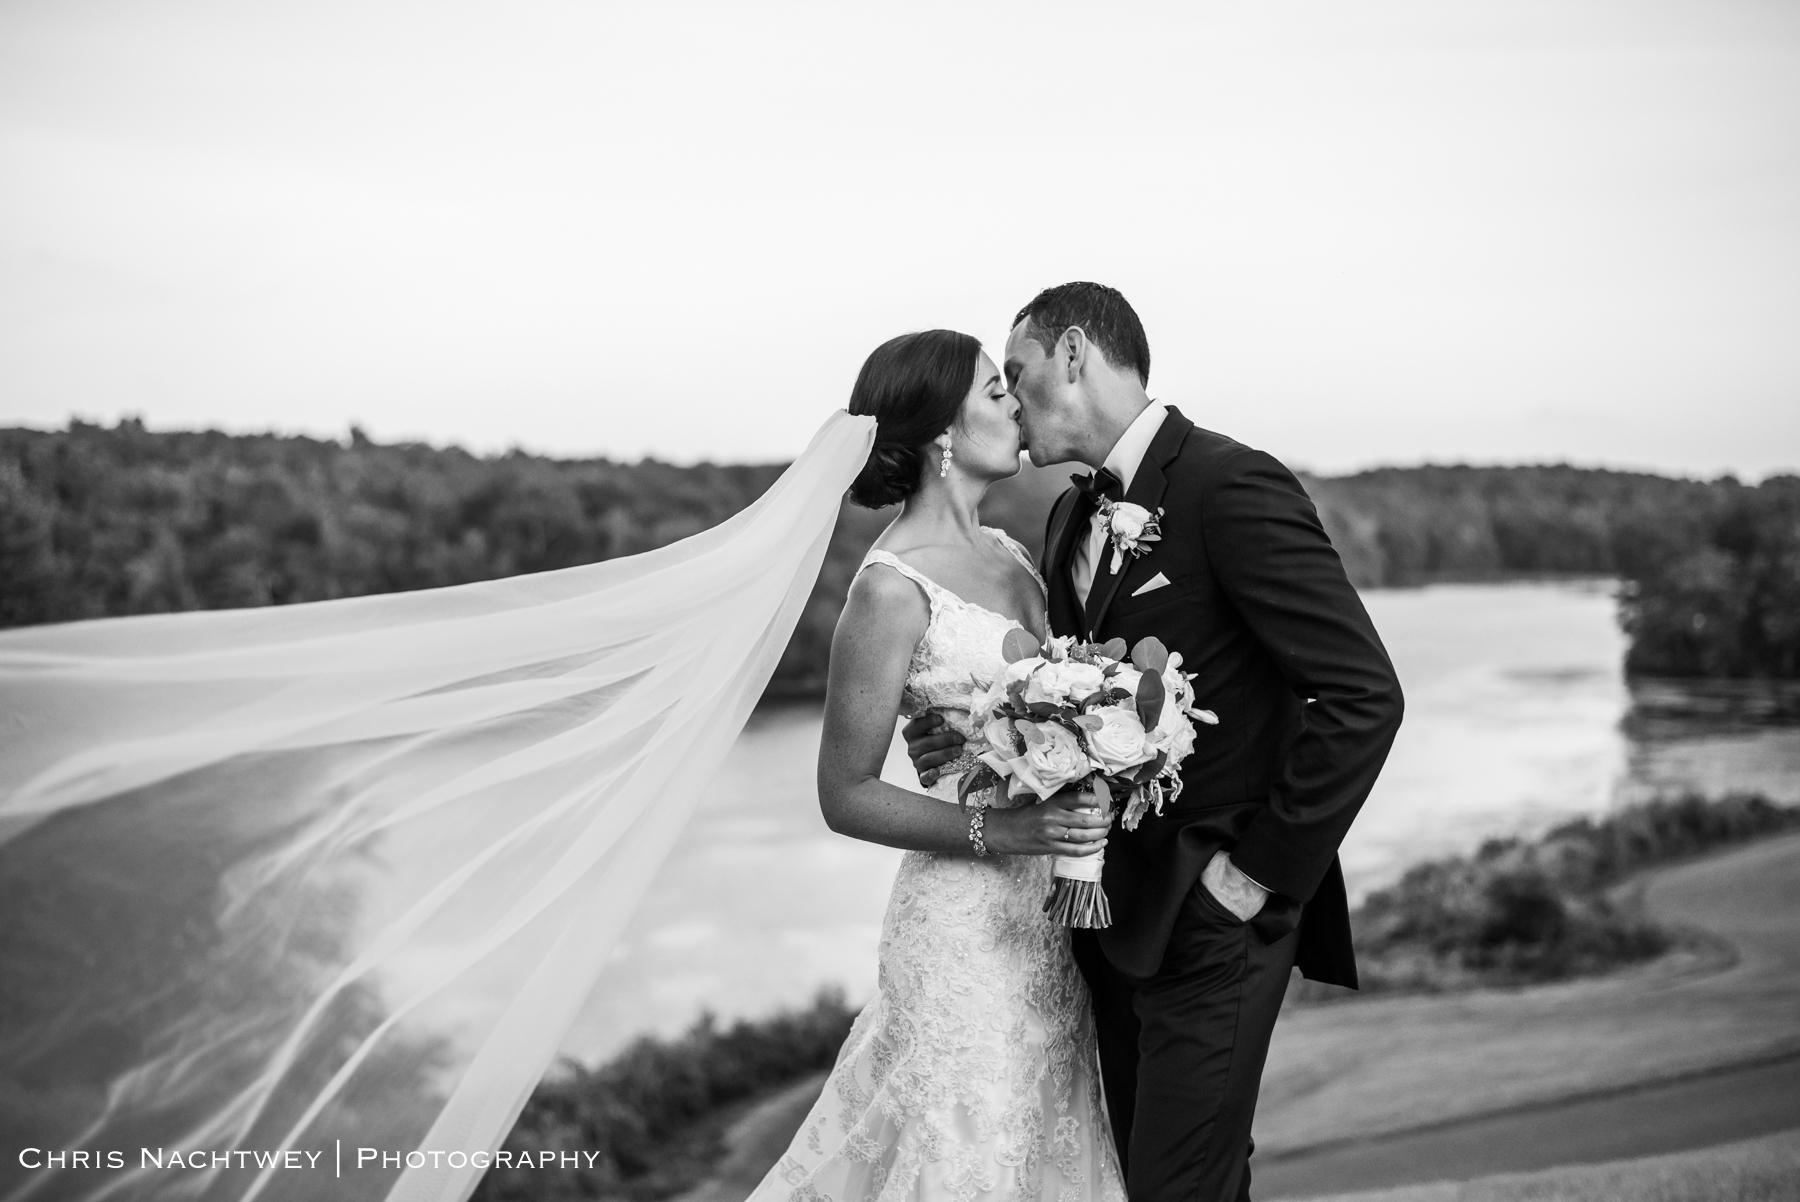 wedding-lake-of-isles-photos-chris-nachtwey-photography-2019-46.jpg